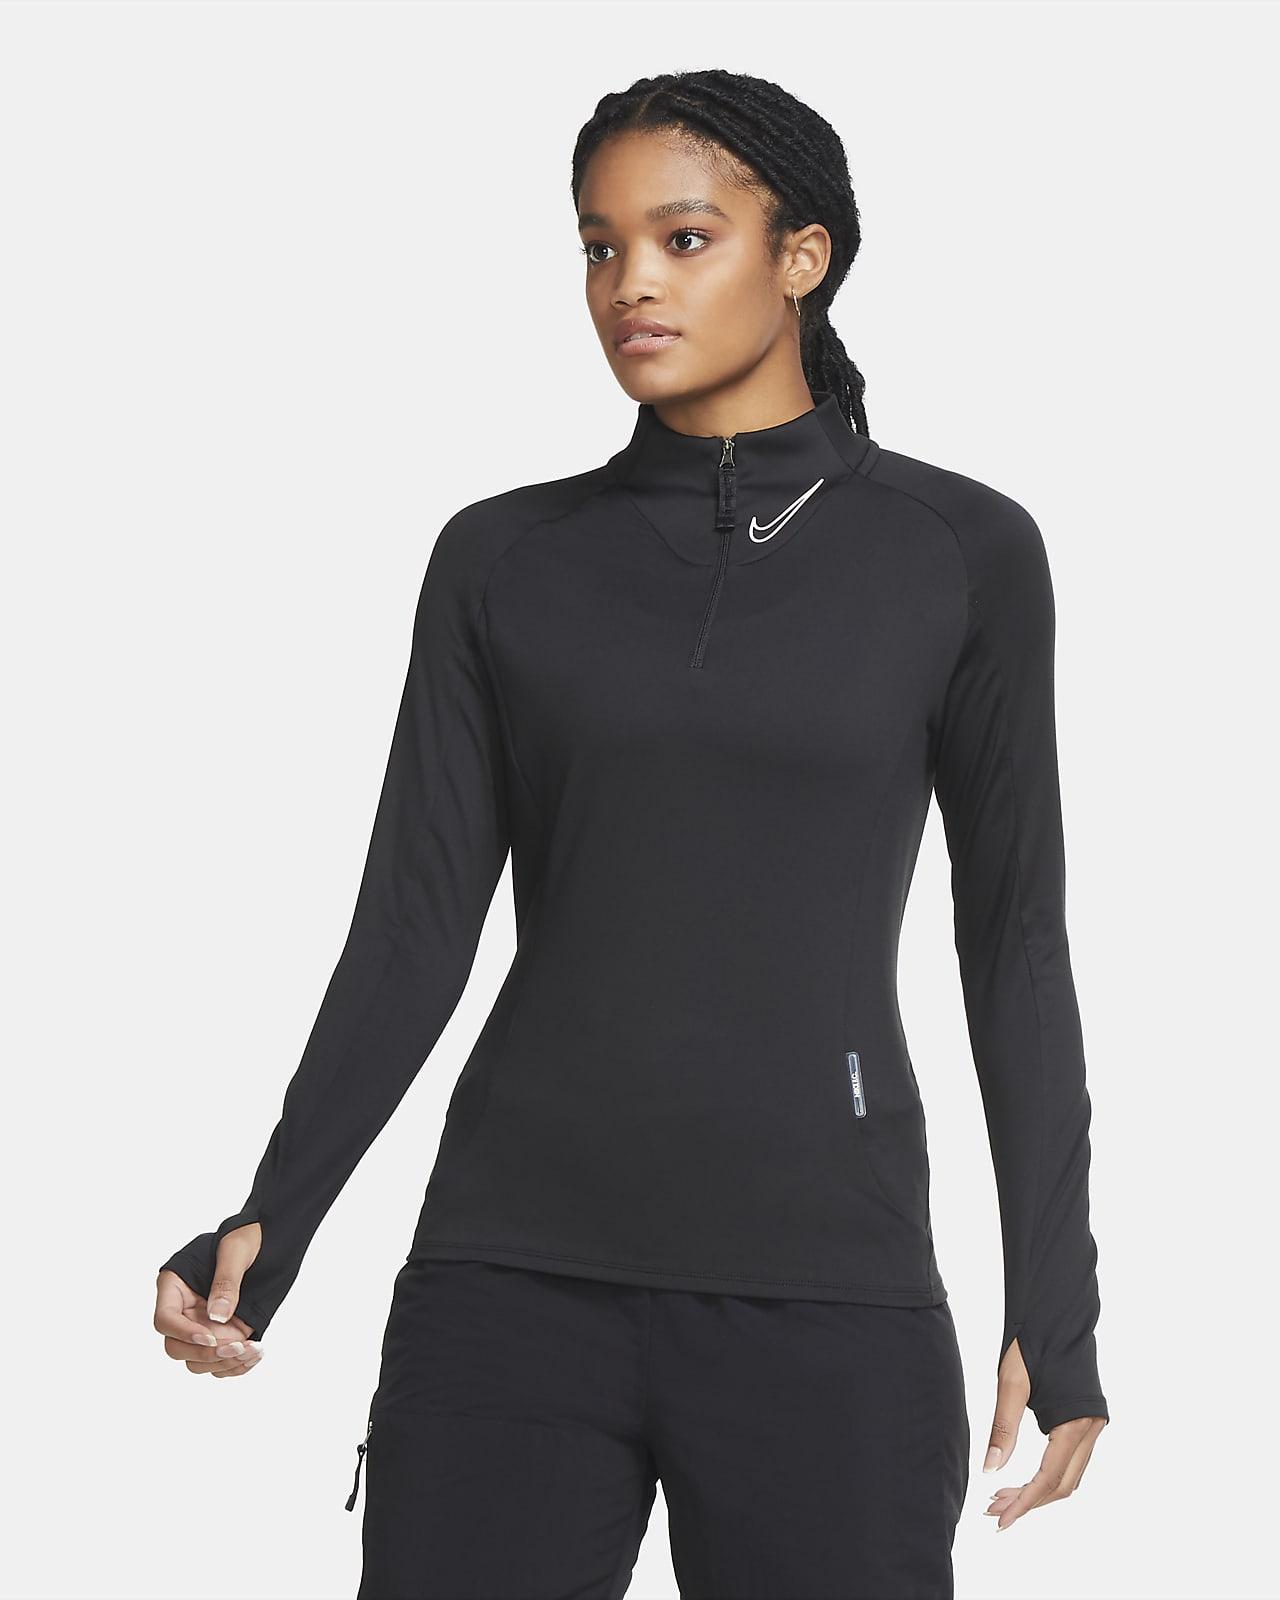 Nike F.C. Women's 1/4-Zip Midlayer Football Top